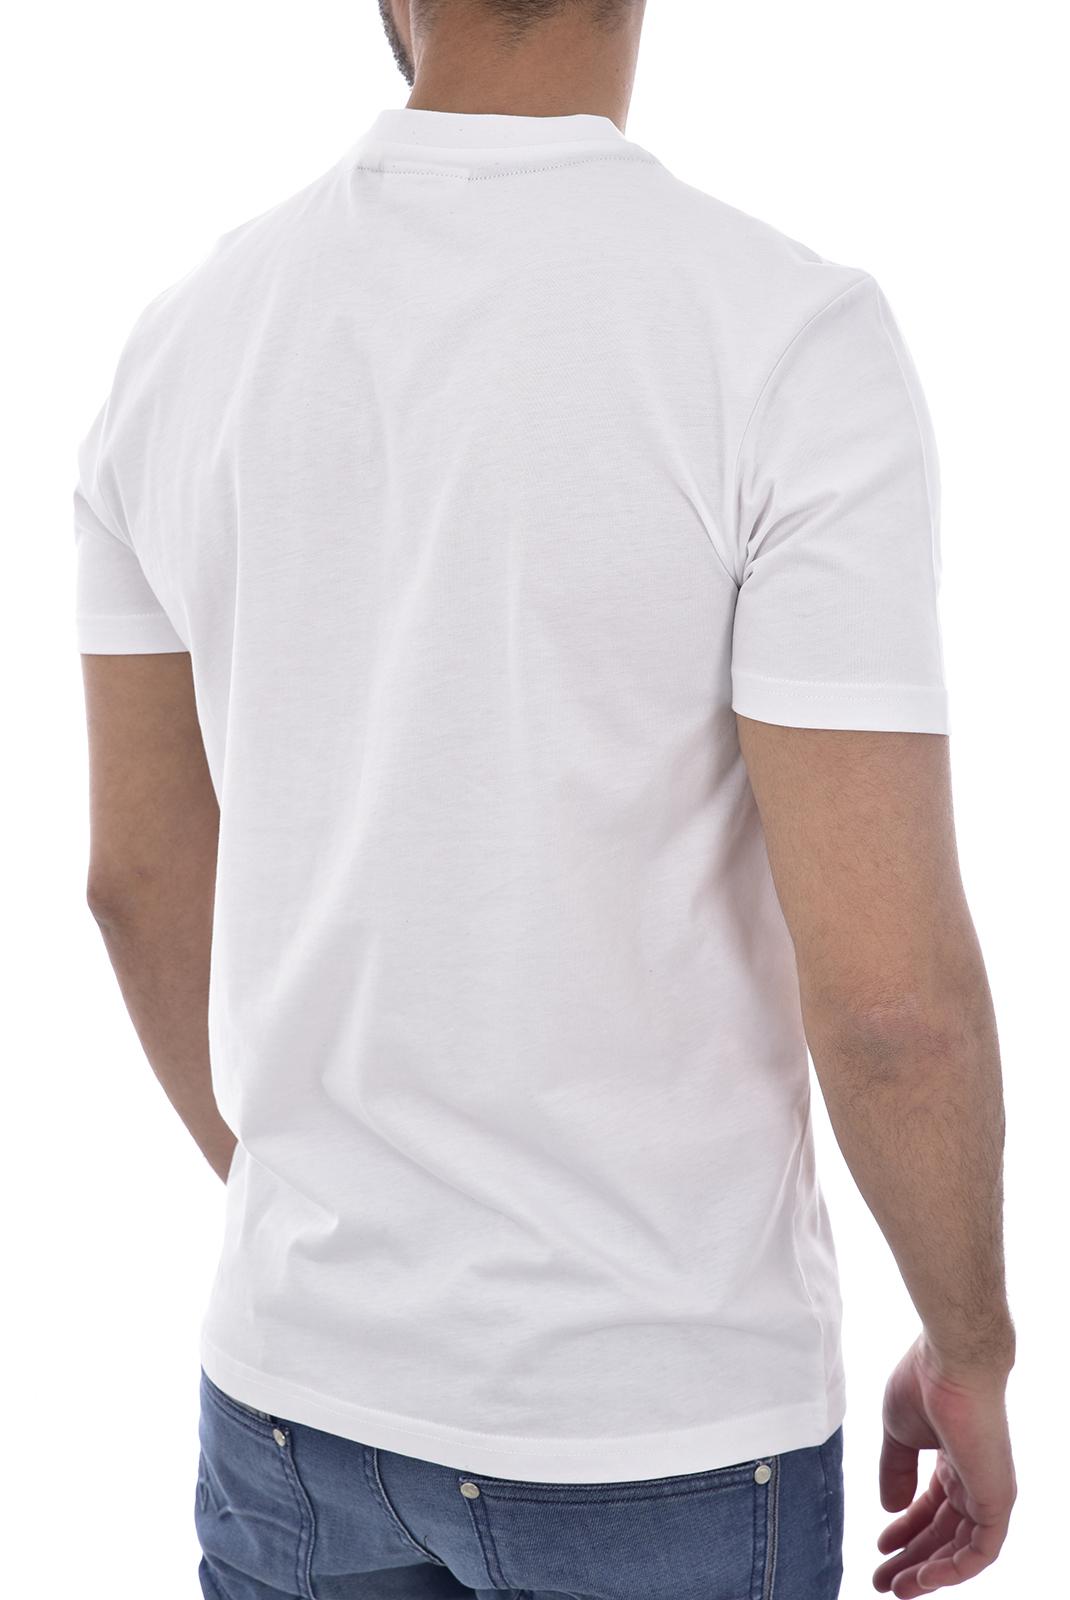 Tee-shirts  Kaporal MED WHITE